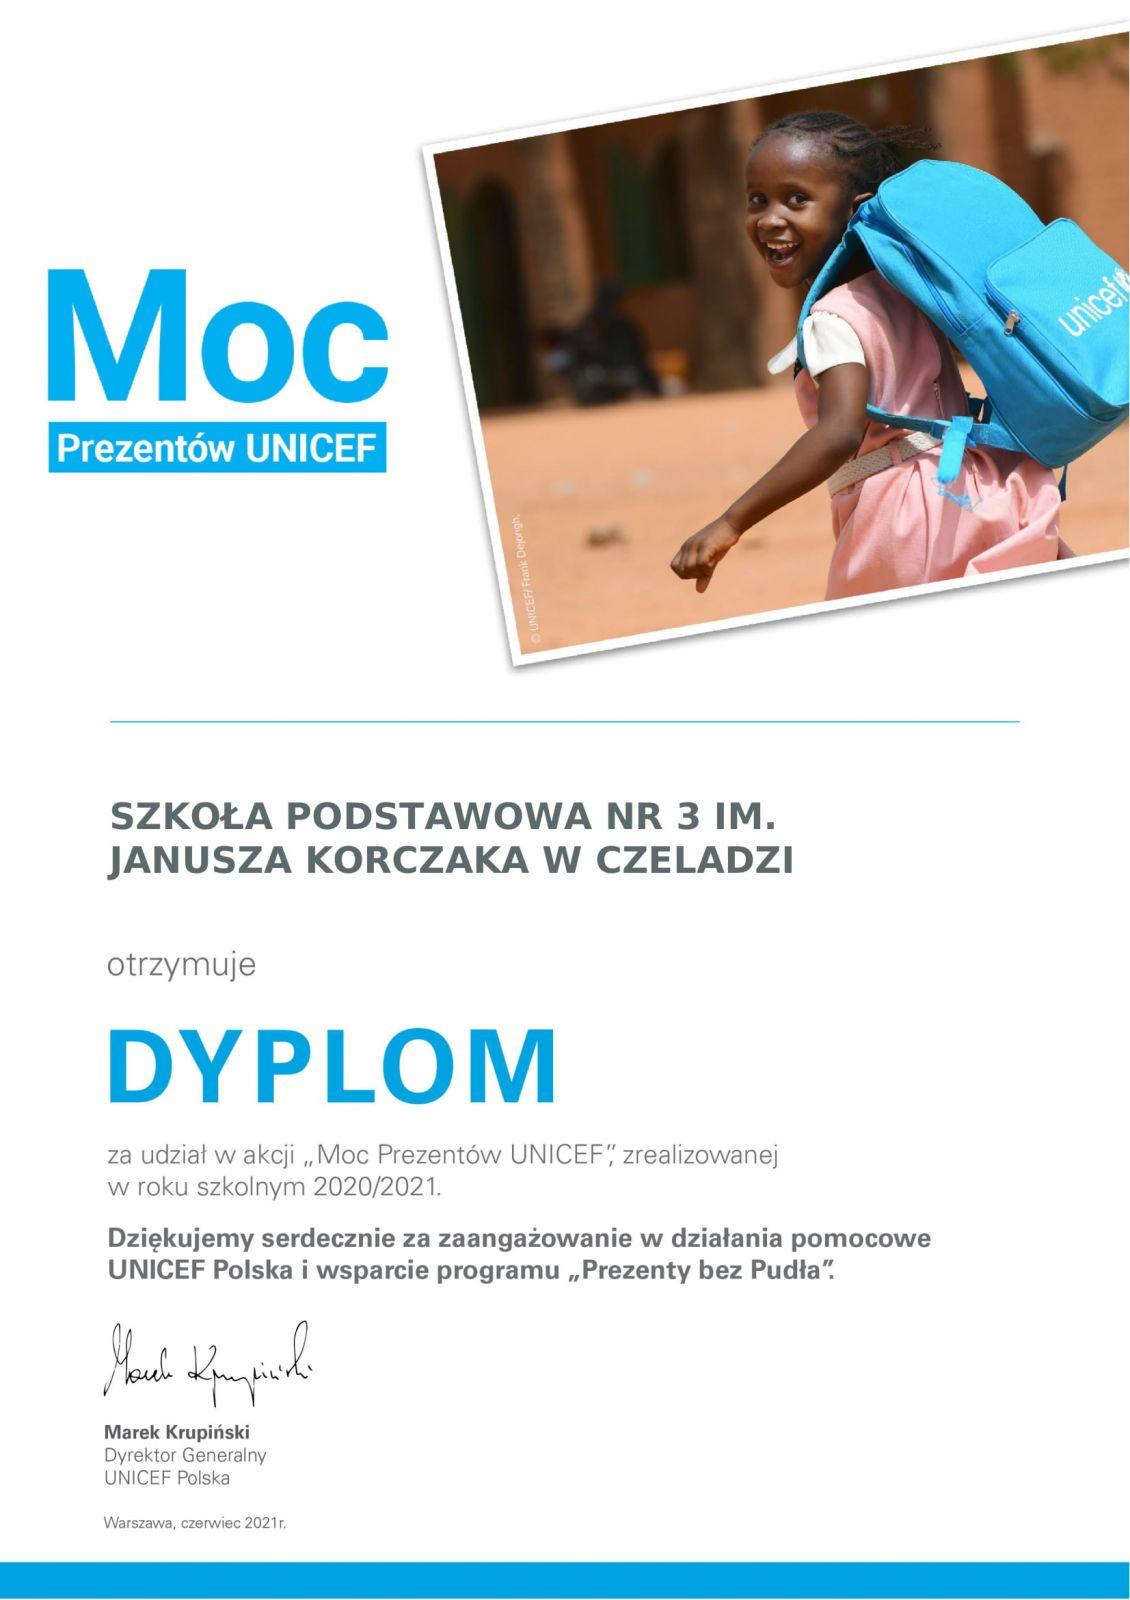 dyplom UNICEF